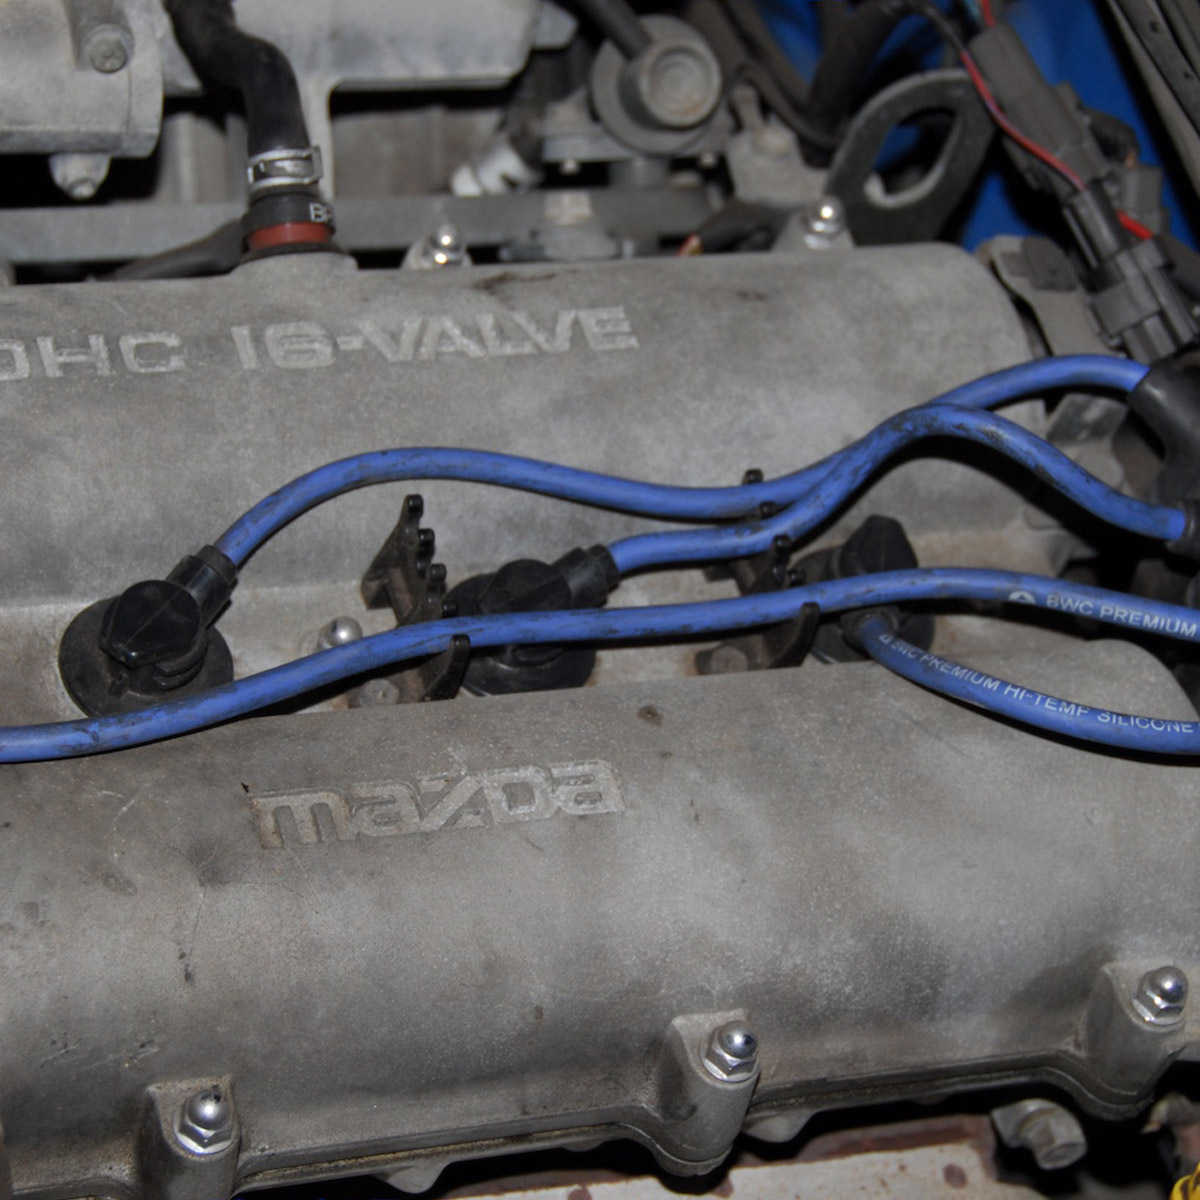 Spark Plug Cable Replacement Costs Repairs Autoguru Ac Wiring Mazda Parts